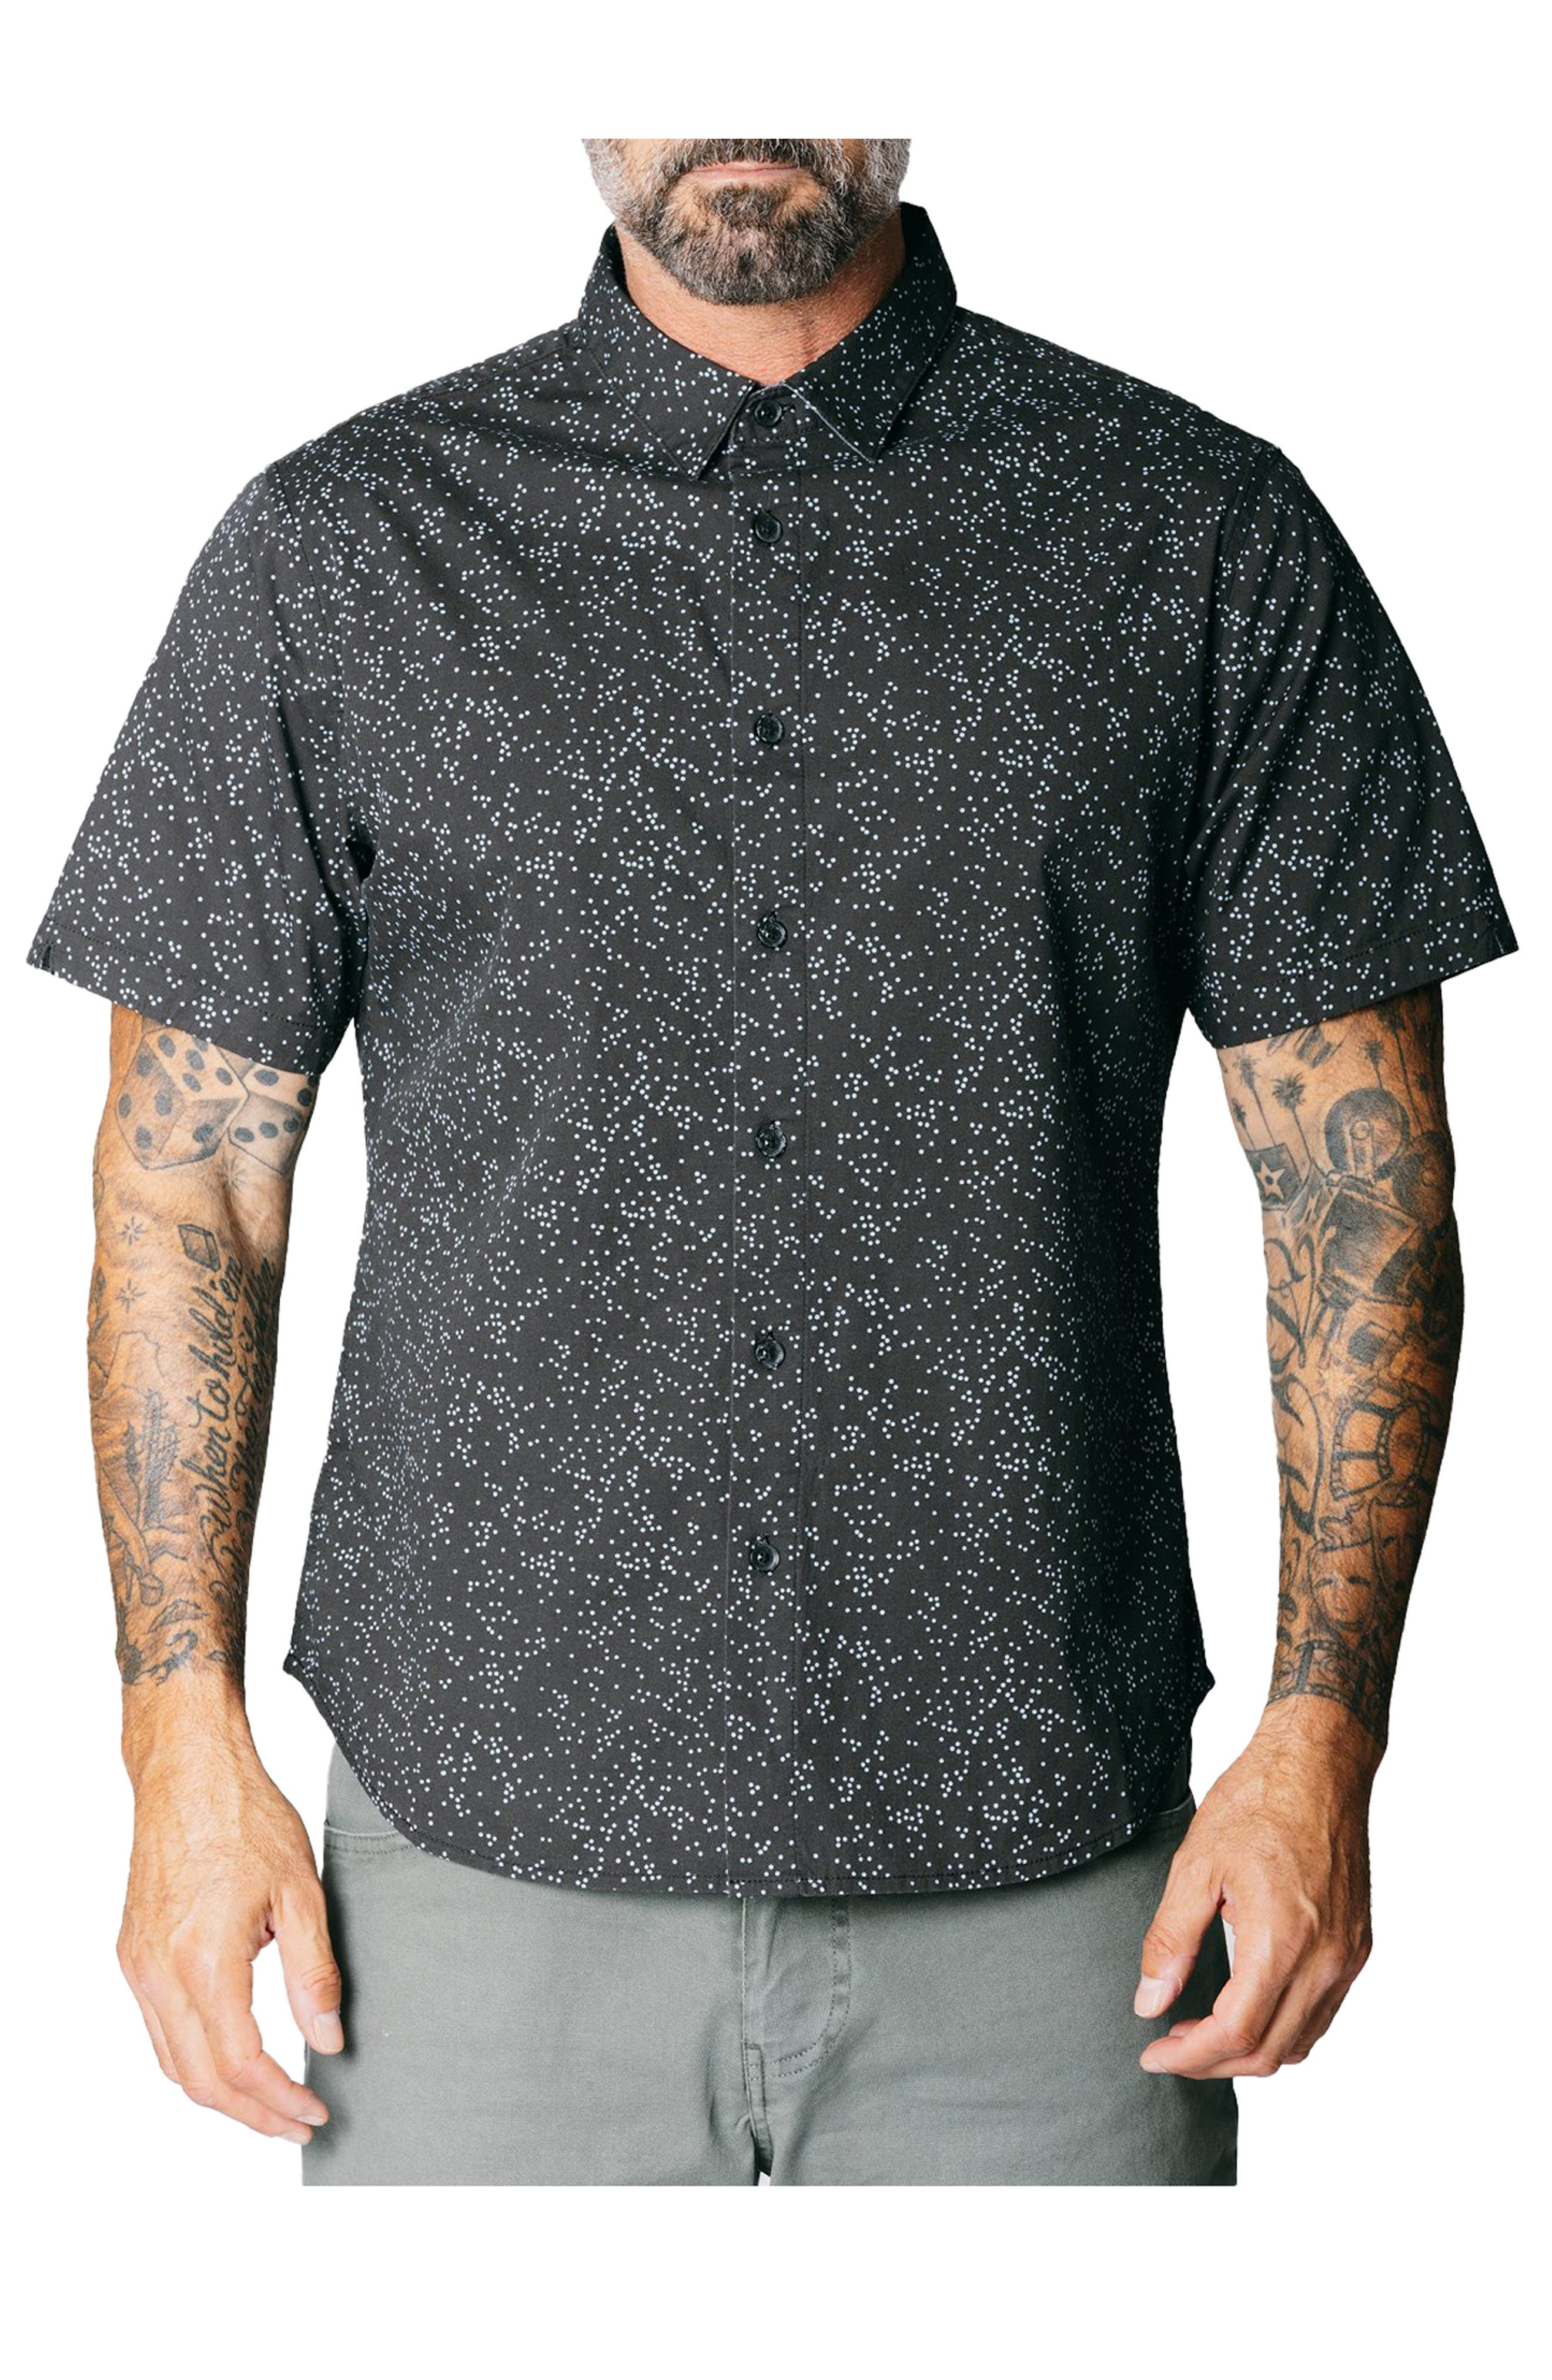 Oh Shore Dot Print Stretch Short Sleeve Button-Up Shirt